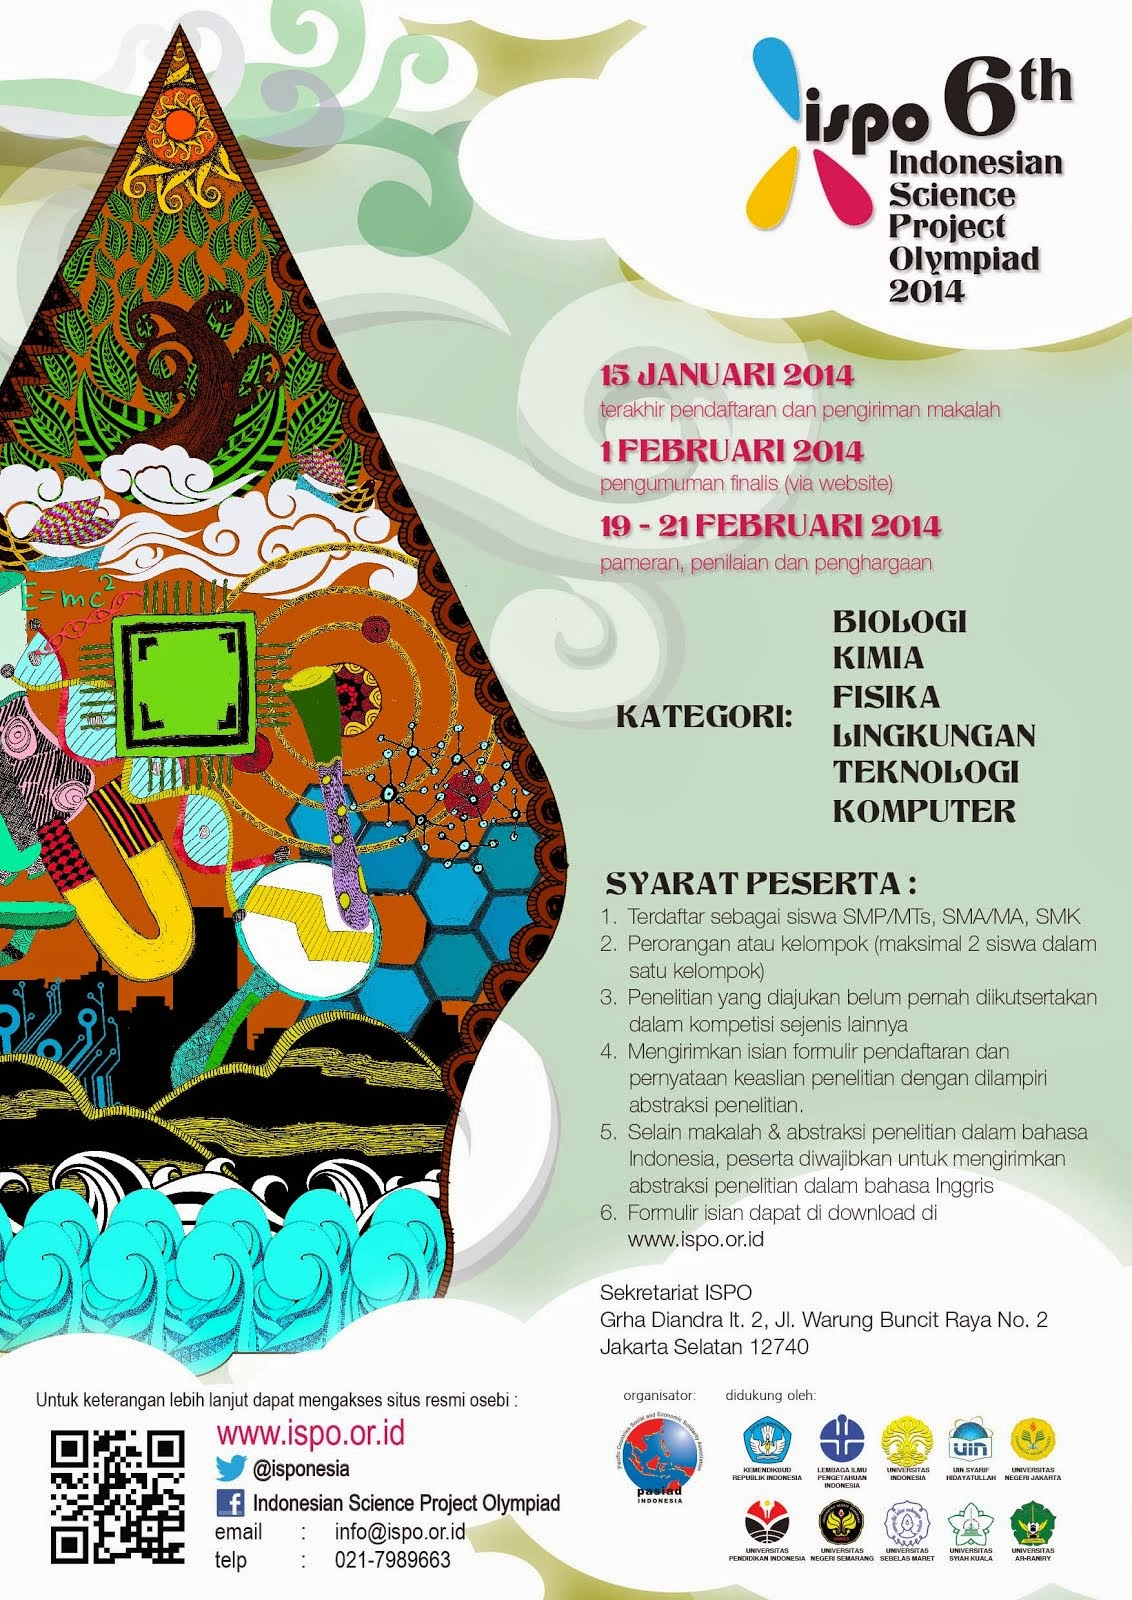 Selamat untuk para peraih Mendali ISPO 2014 (Indonesian Science Project Olympiad)